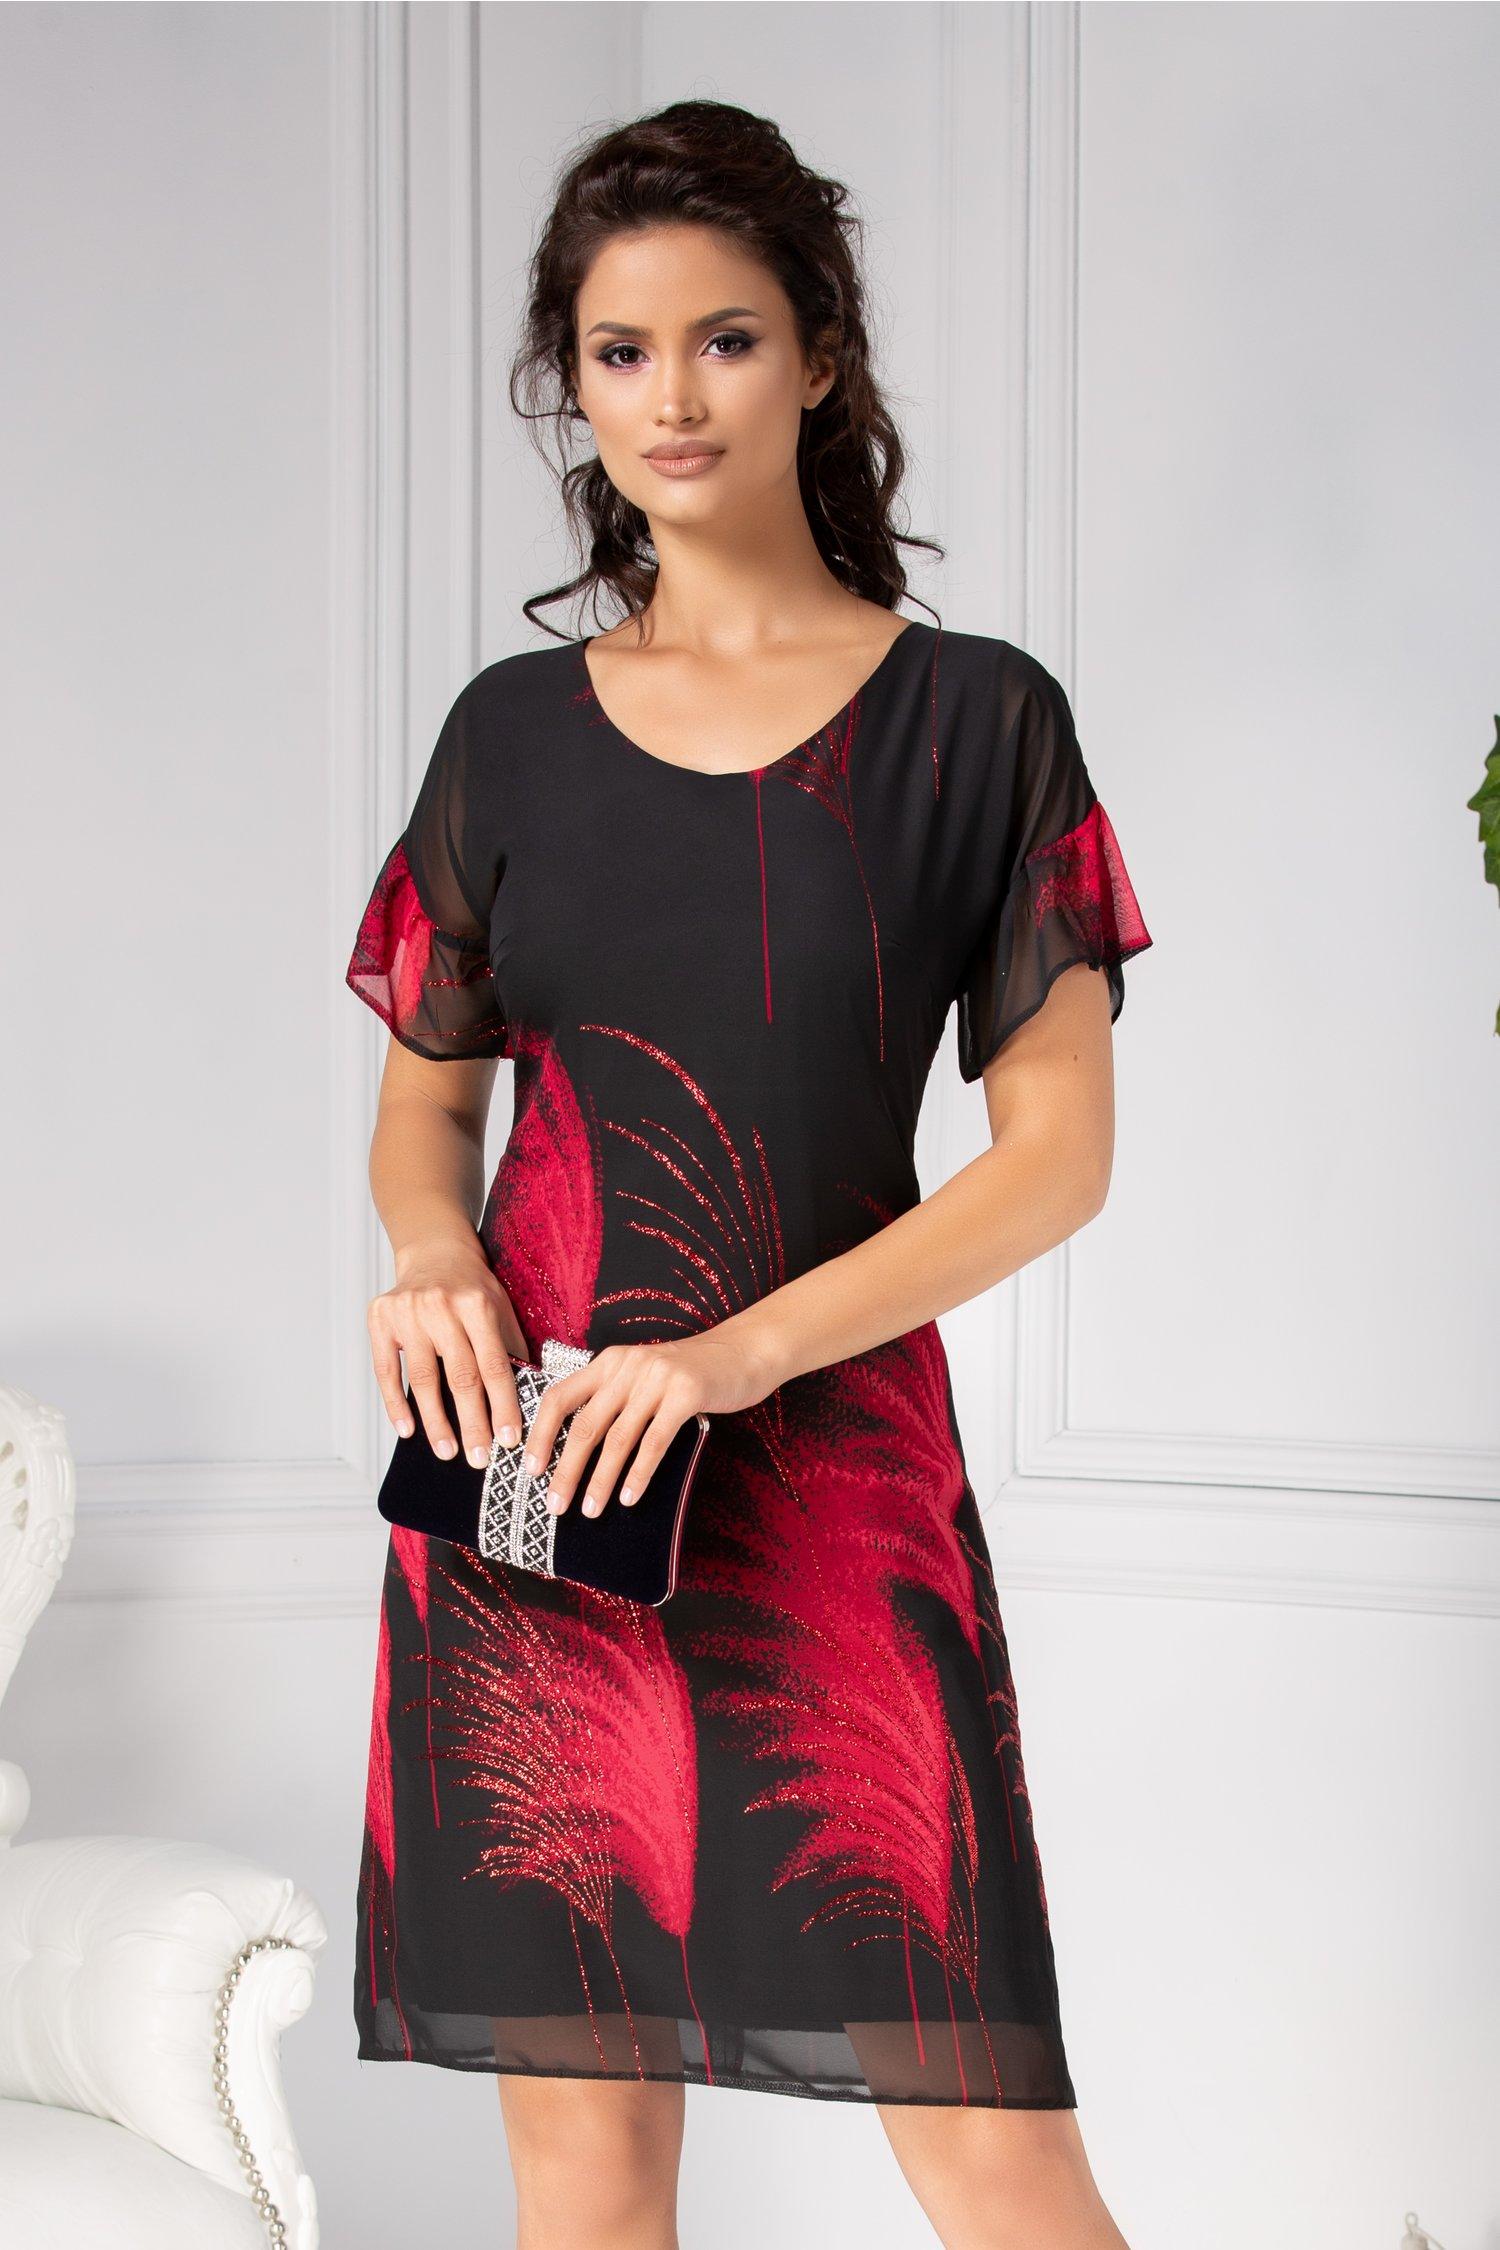 Rochie Moze neagra lejera cu imprimeu rosu deosebit